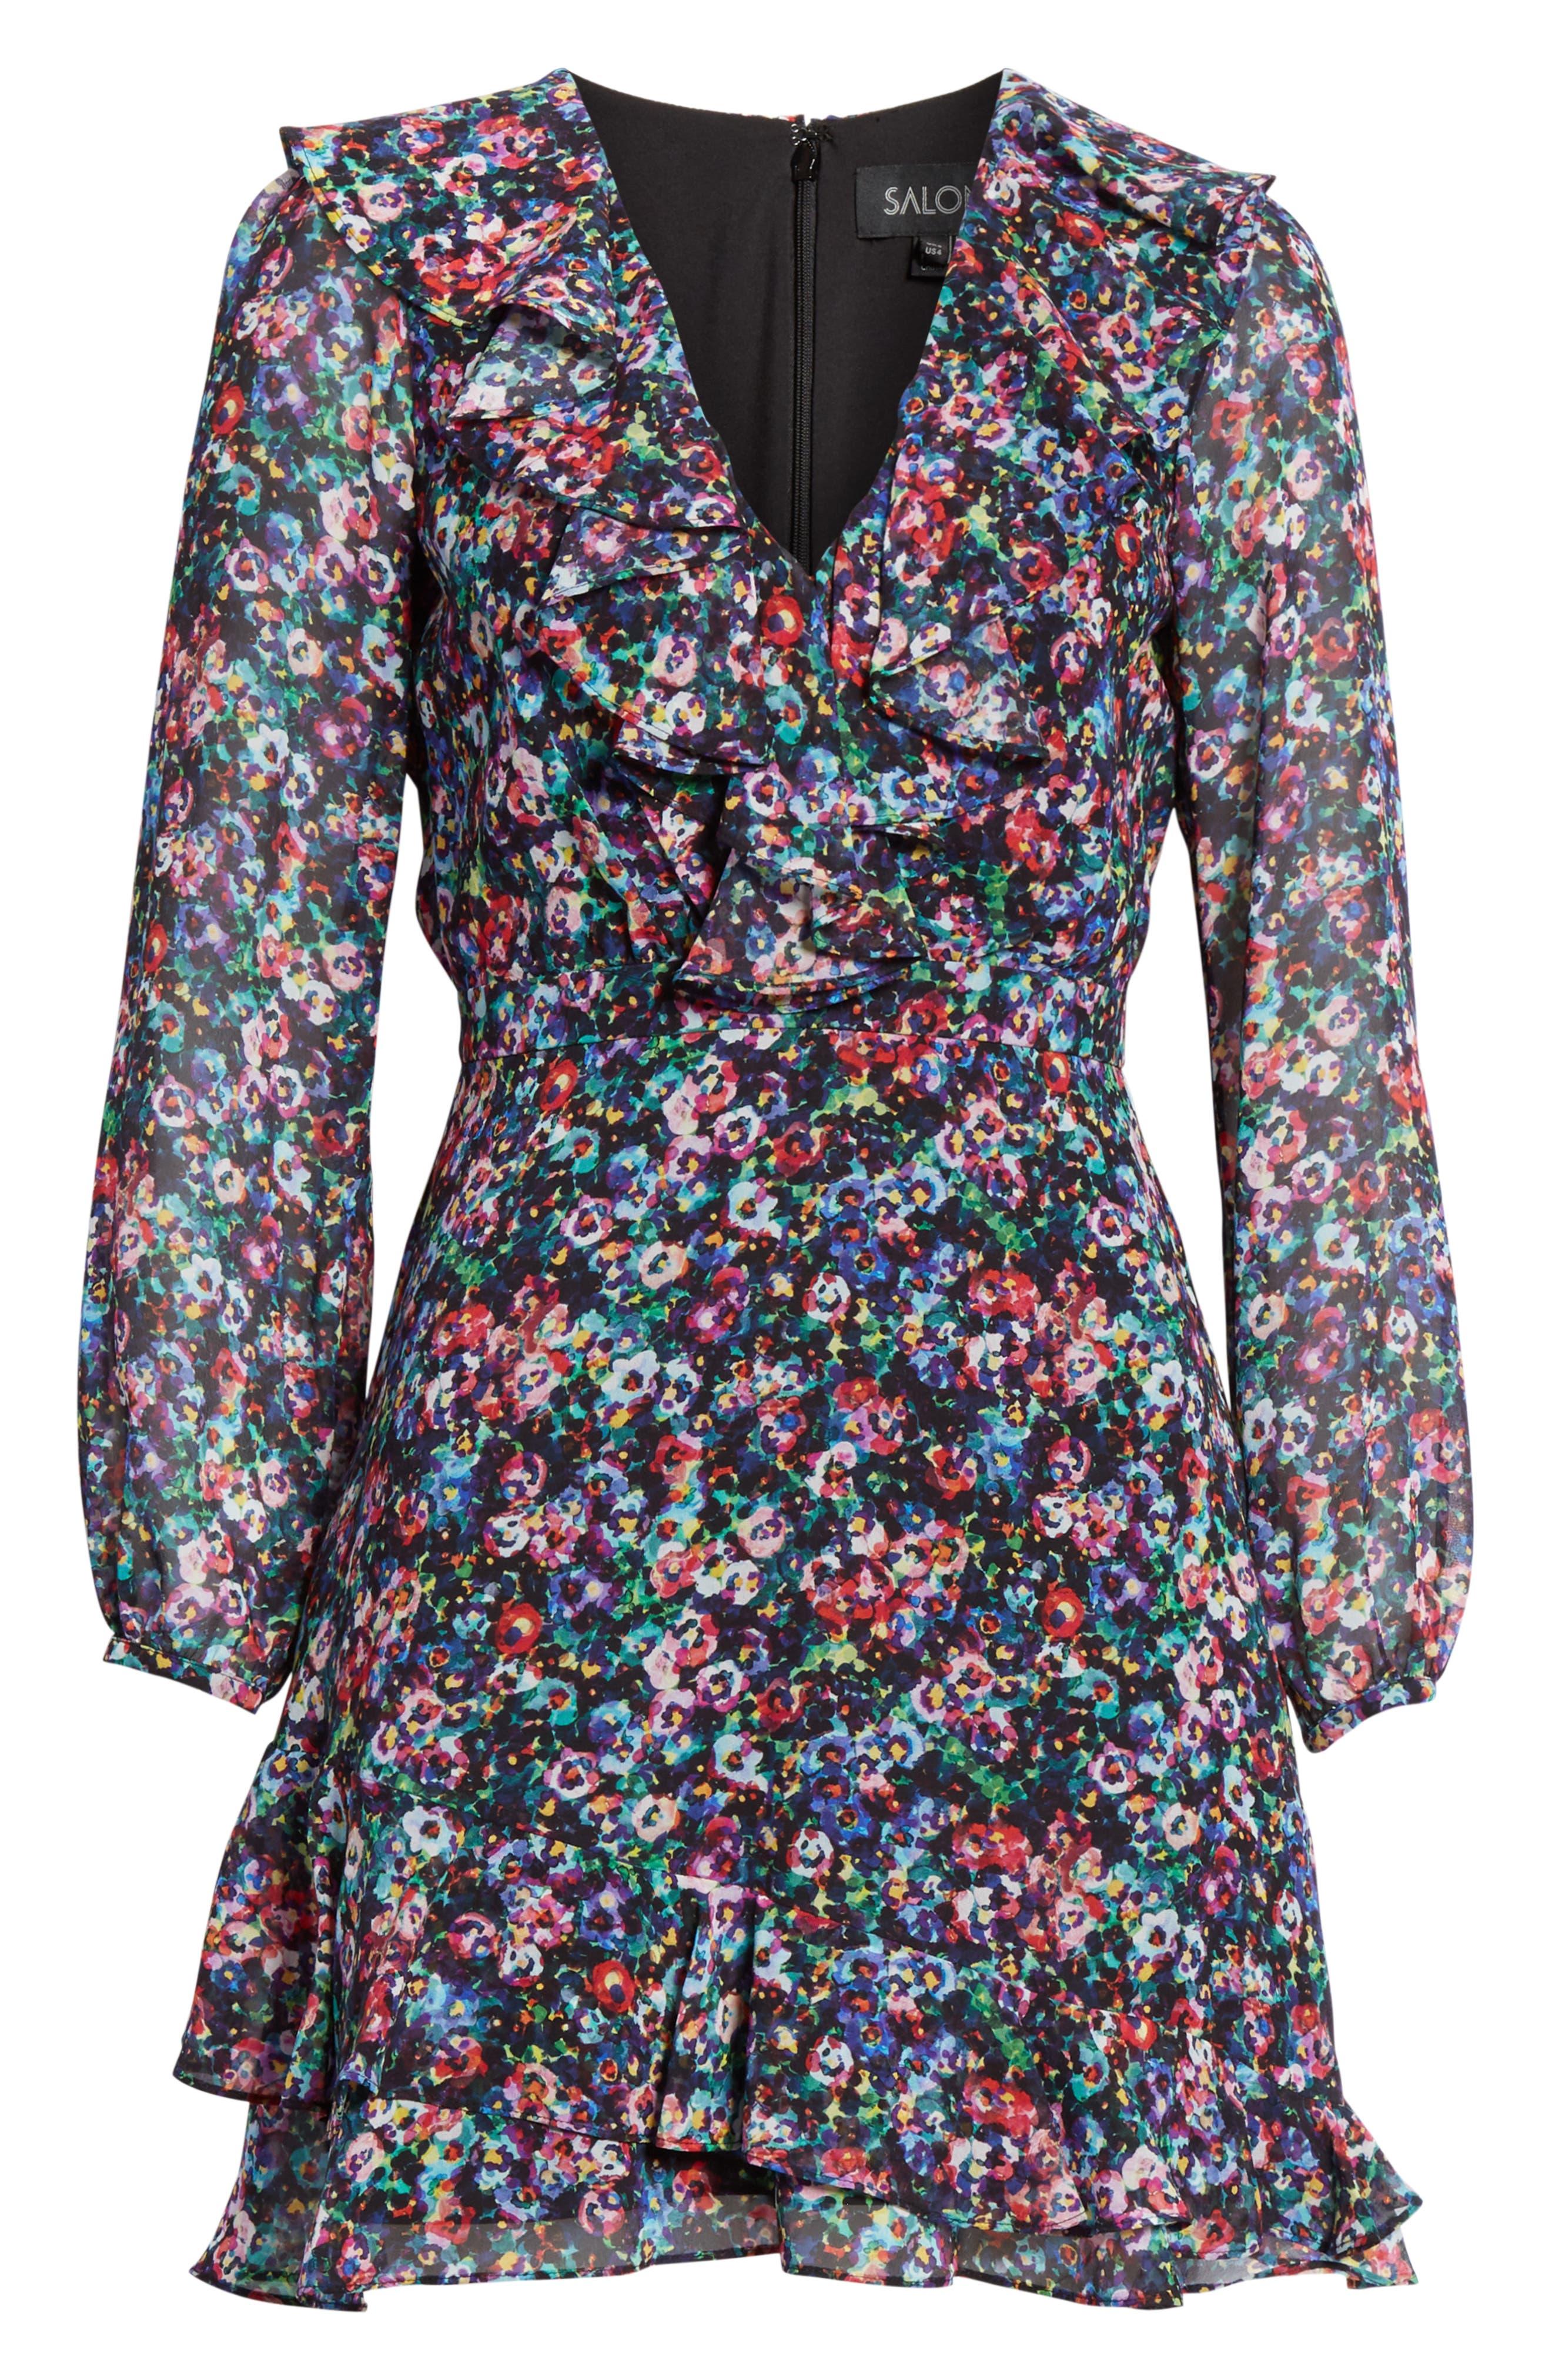 SALONI, Jodie Floral Print Silk Minidress, Alternate thumbnail 7, color, JEWEL ROSETTE